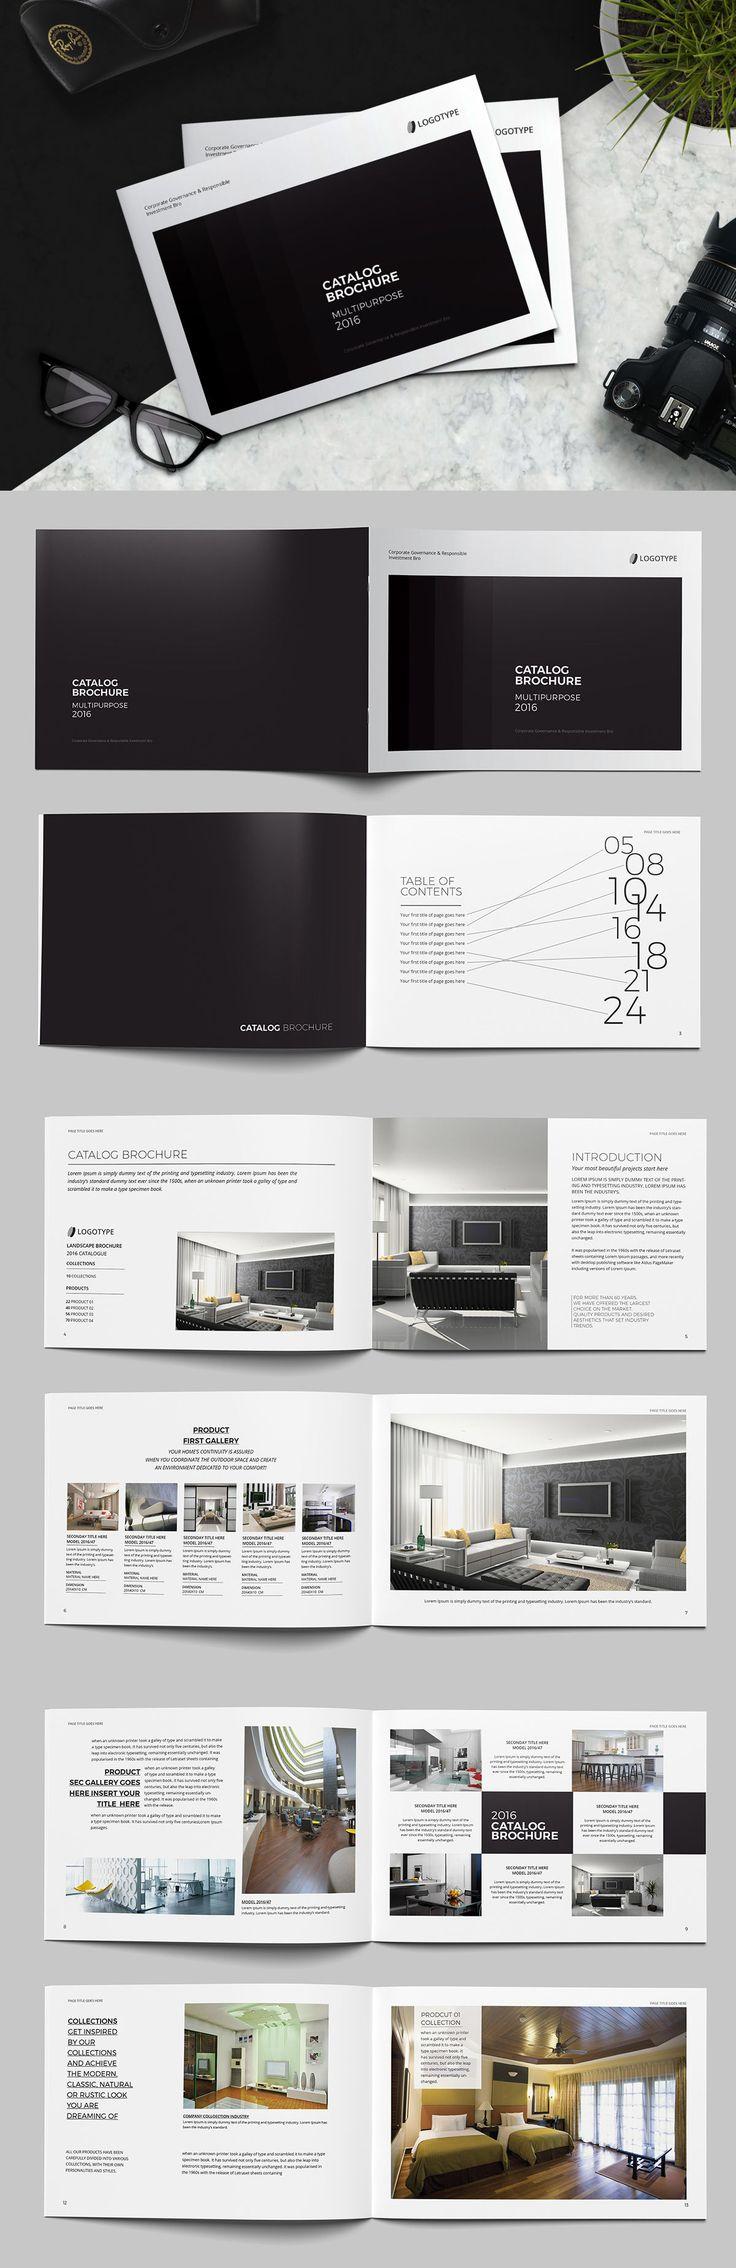 Best 25+ Catalog design ideas on Pinterest | Portfolio layout ...